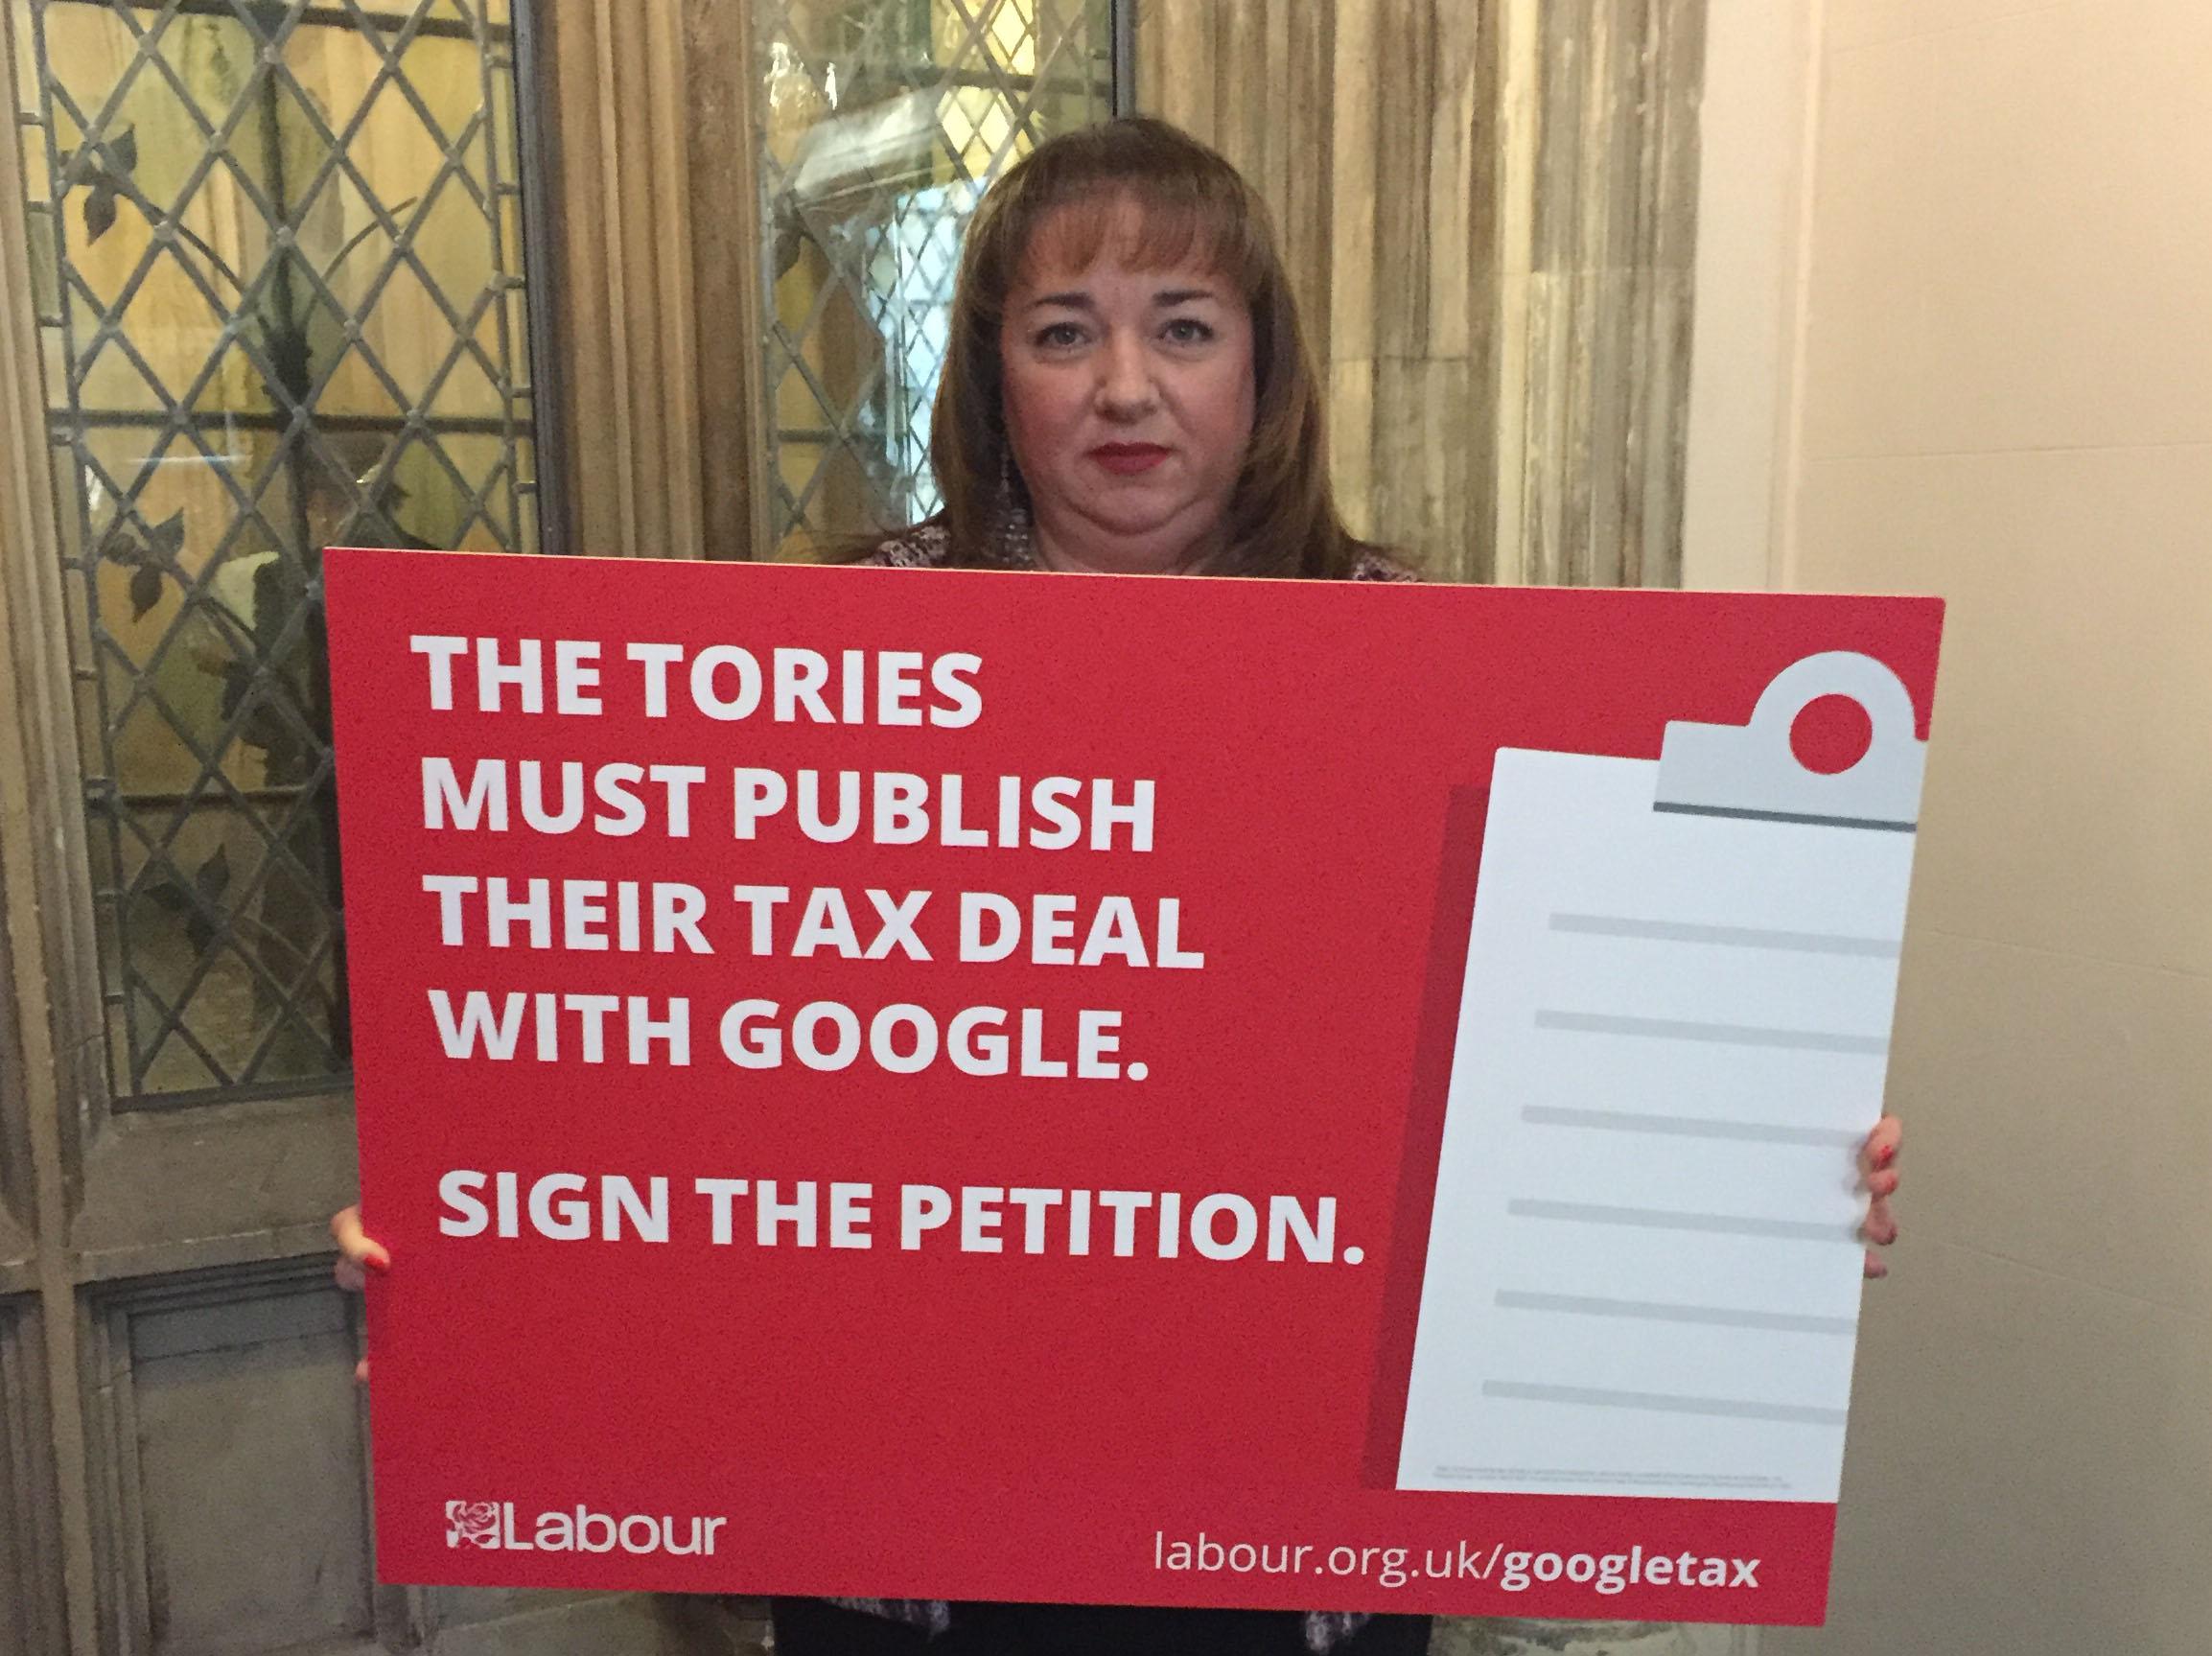 2016_02_03_google_tax_deal_petition_card_IMG_1073.jpg